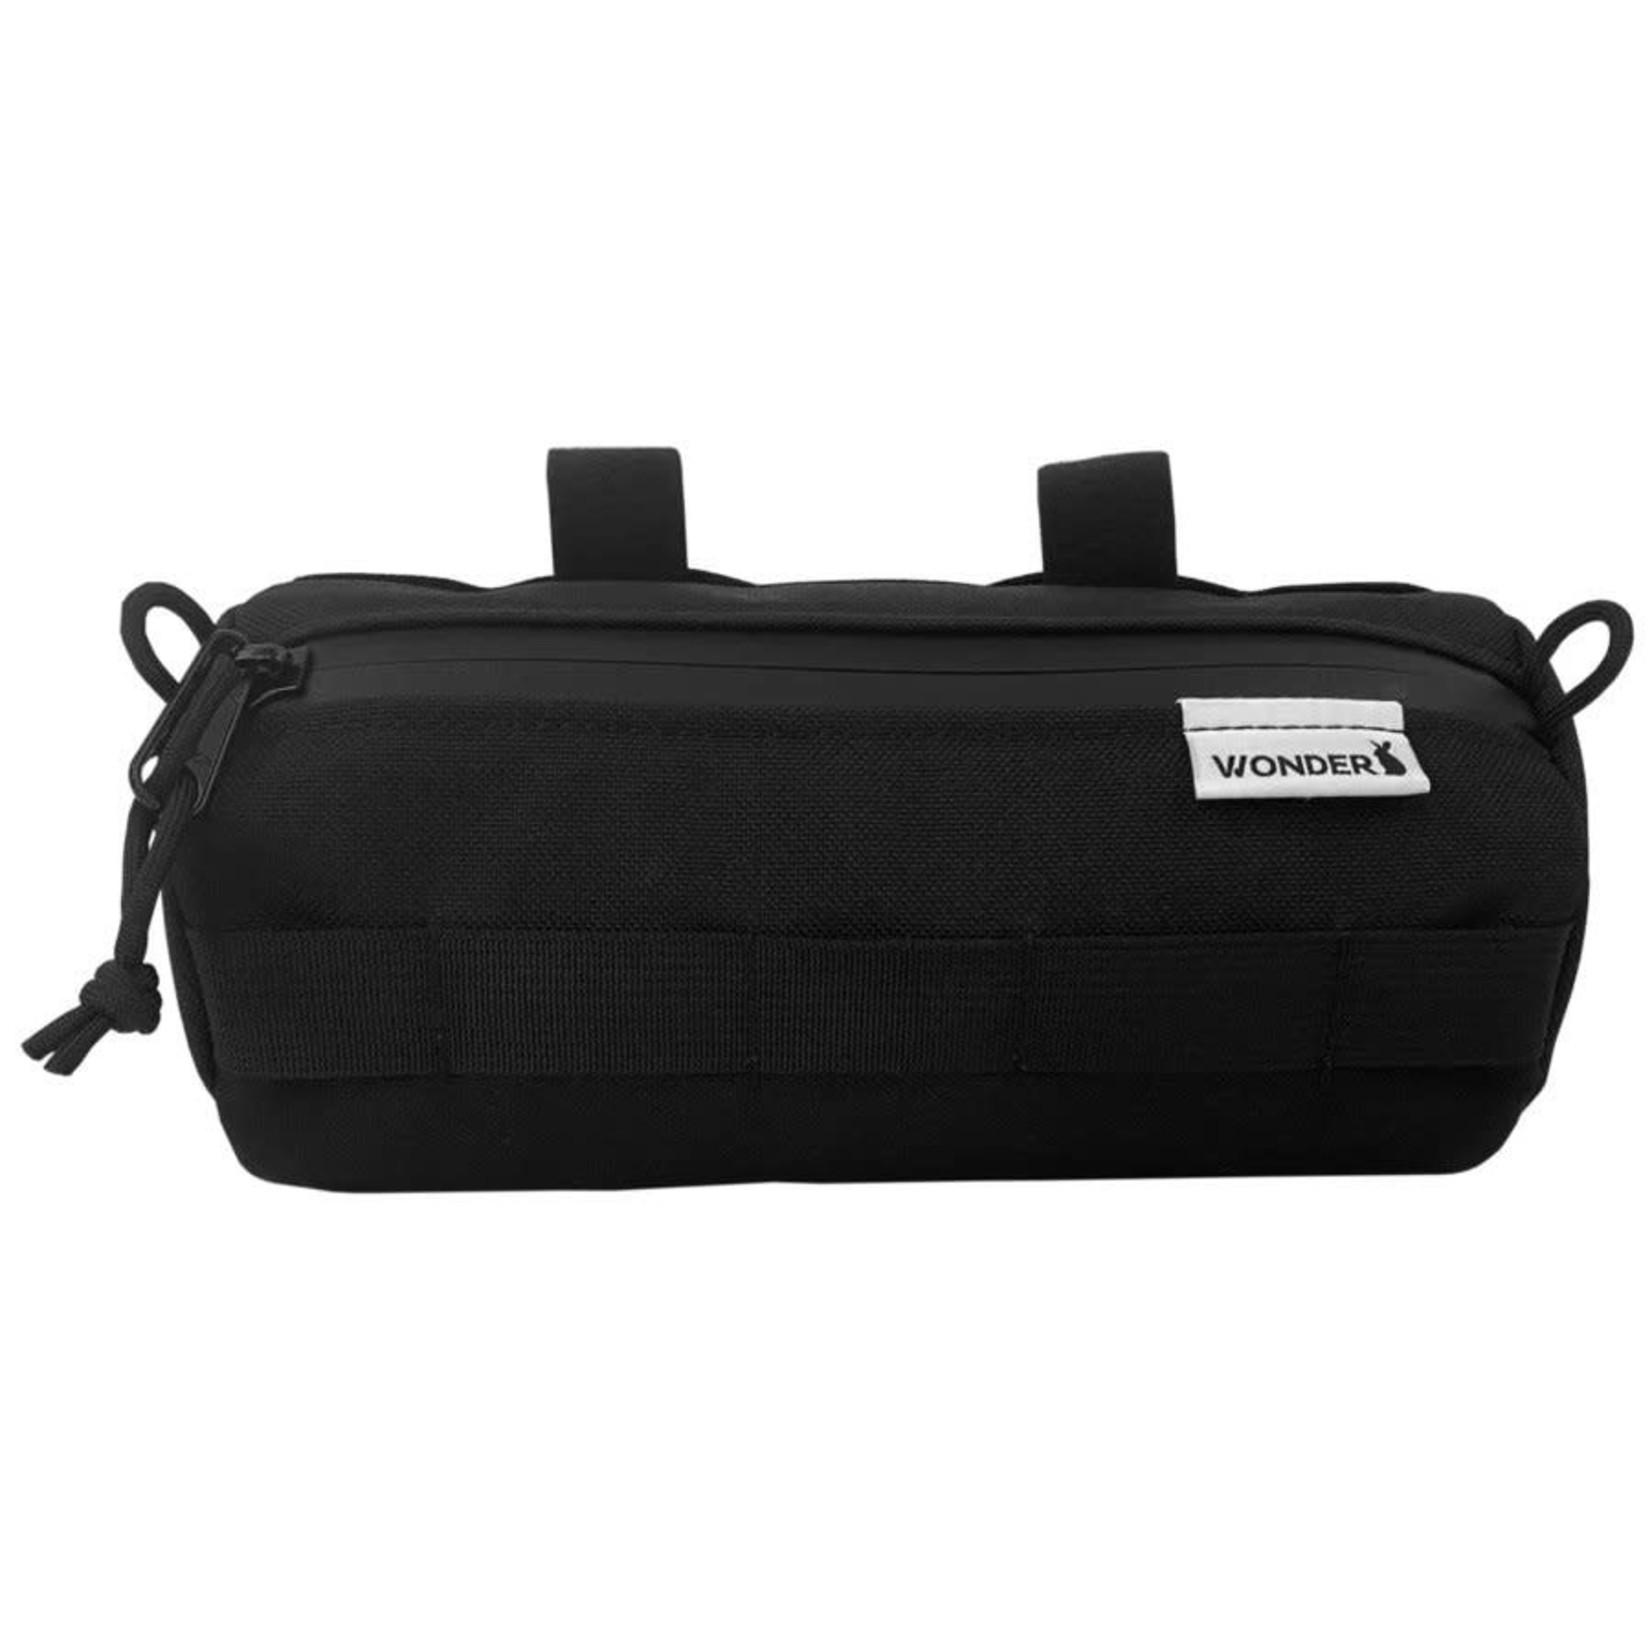 Wonder Goods Wonder Goods Handlebar Bag